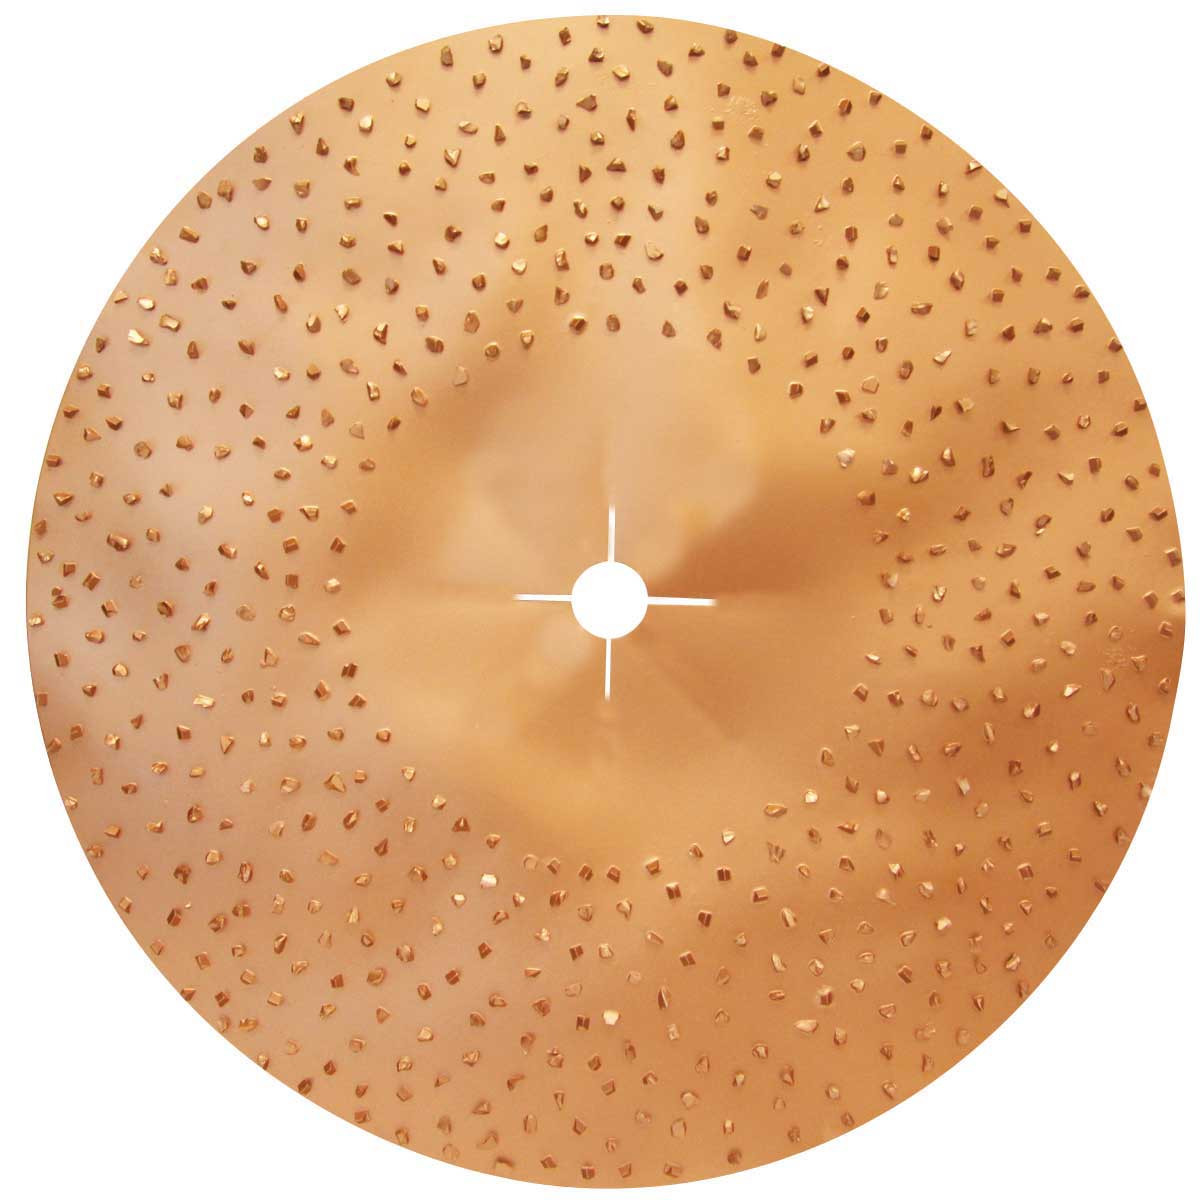 Raimondi Double Sided floor disc